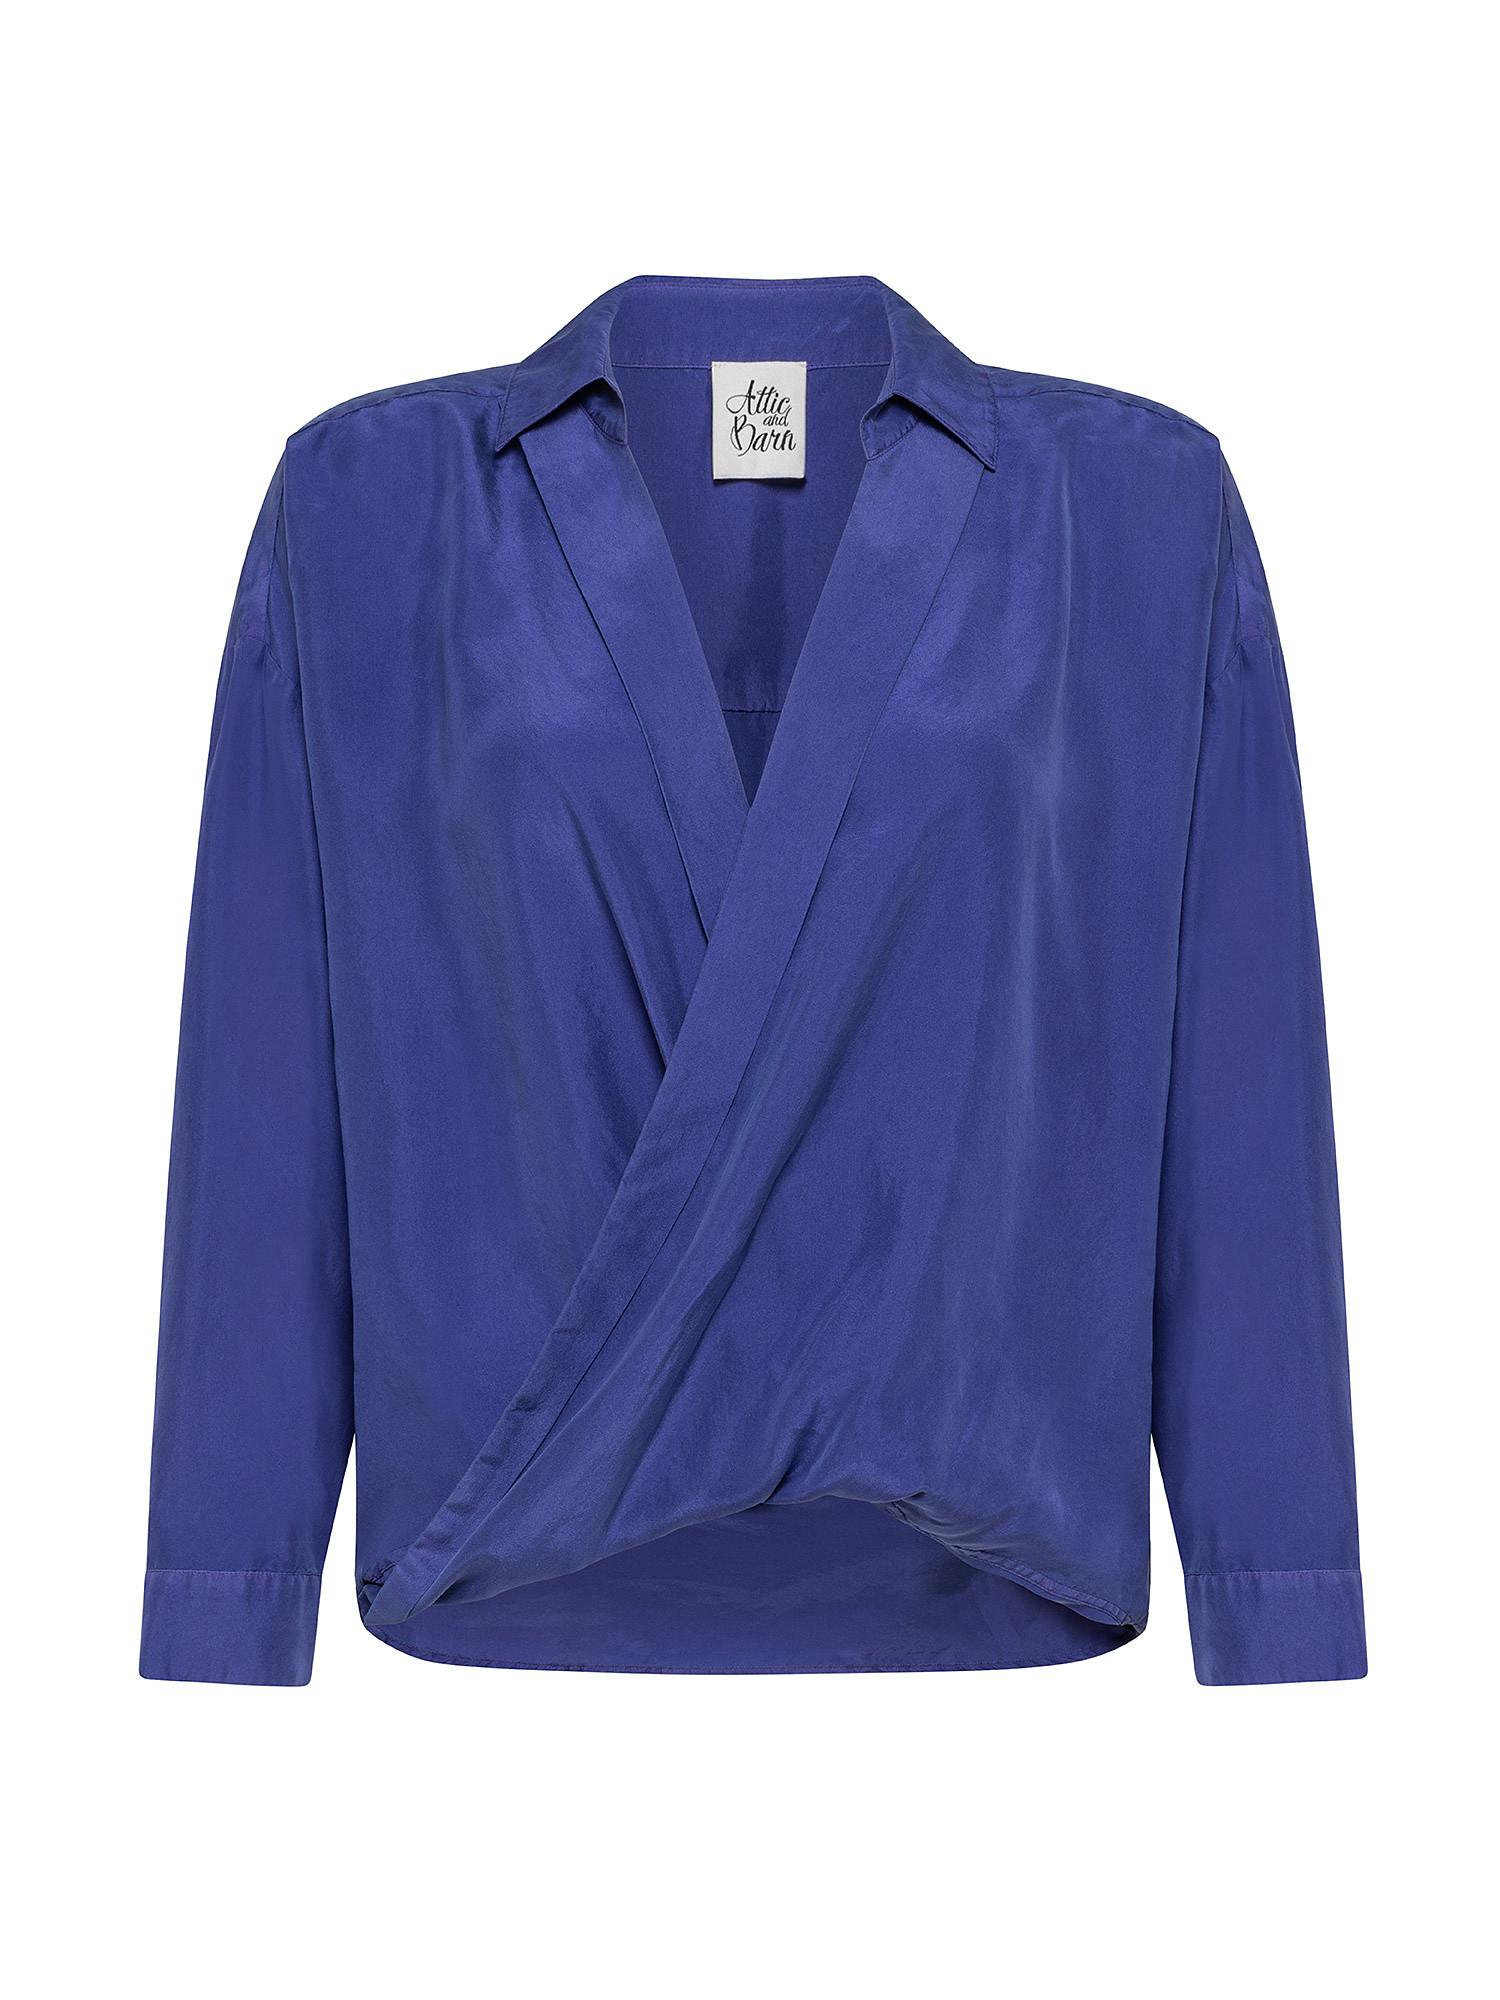 Camicia donna in seta, Azzurro Oceano, large image number 0